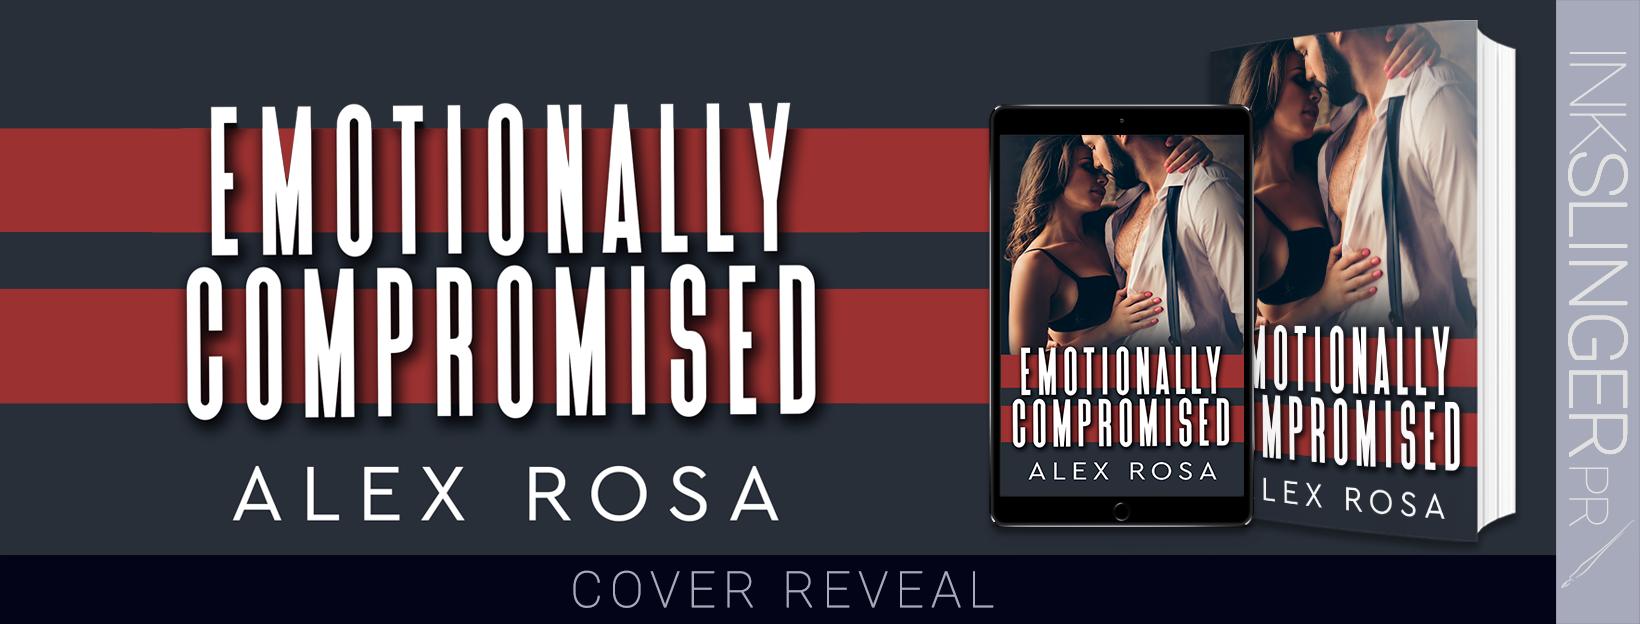 EmotionallyCompromised-Banner